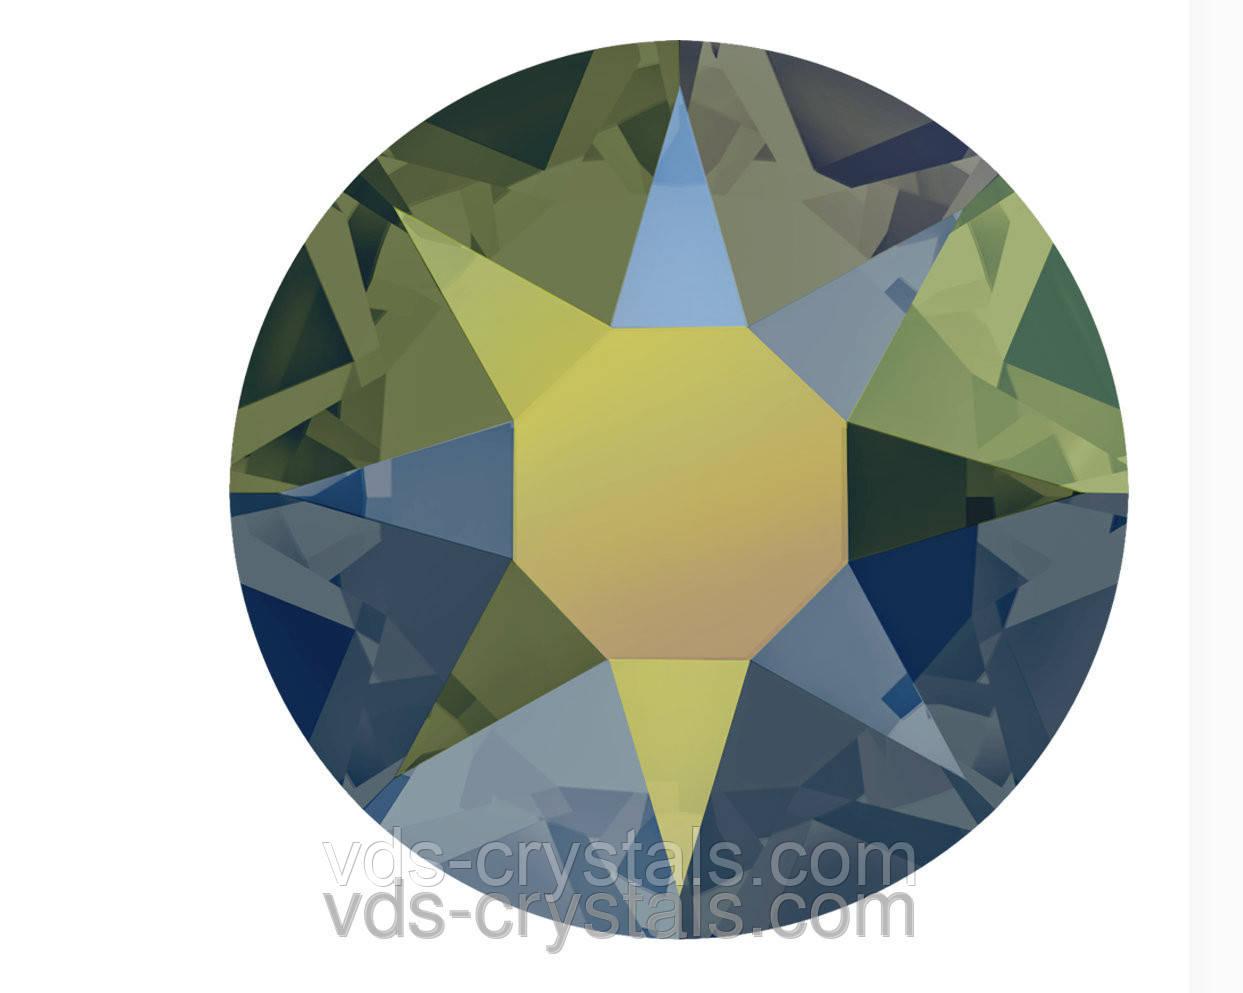 Кристаллы Swarovski клеевые холодной фиксации 2088 Crystal Iridescent Green F (001 IRIG) 12ss (упаковка 1440 шт)